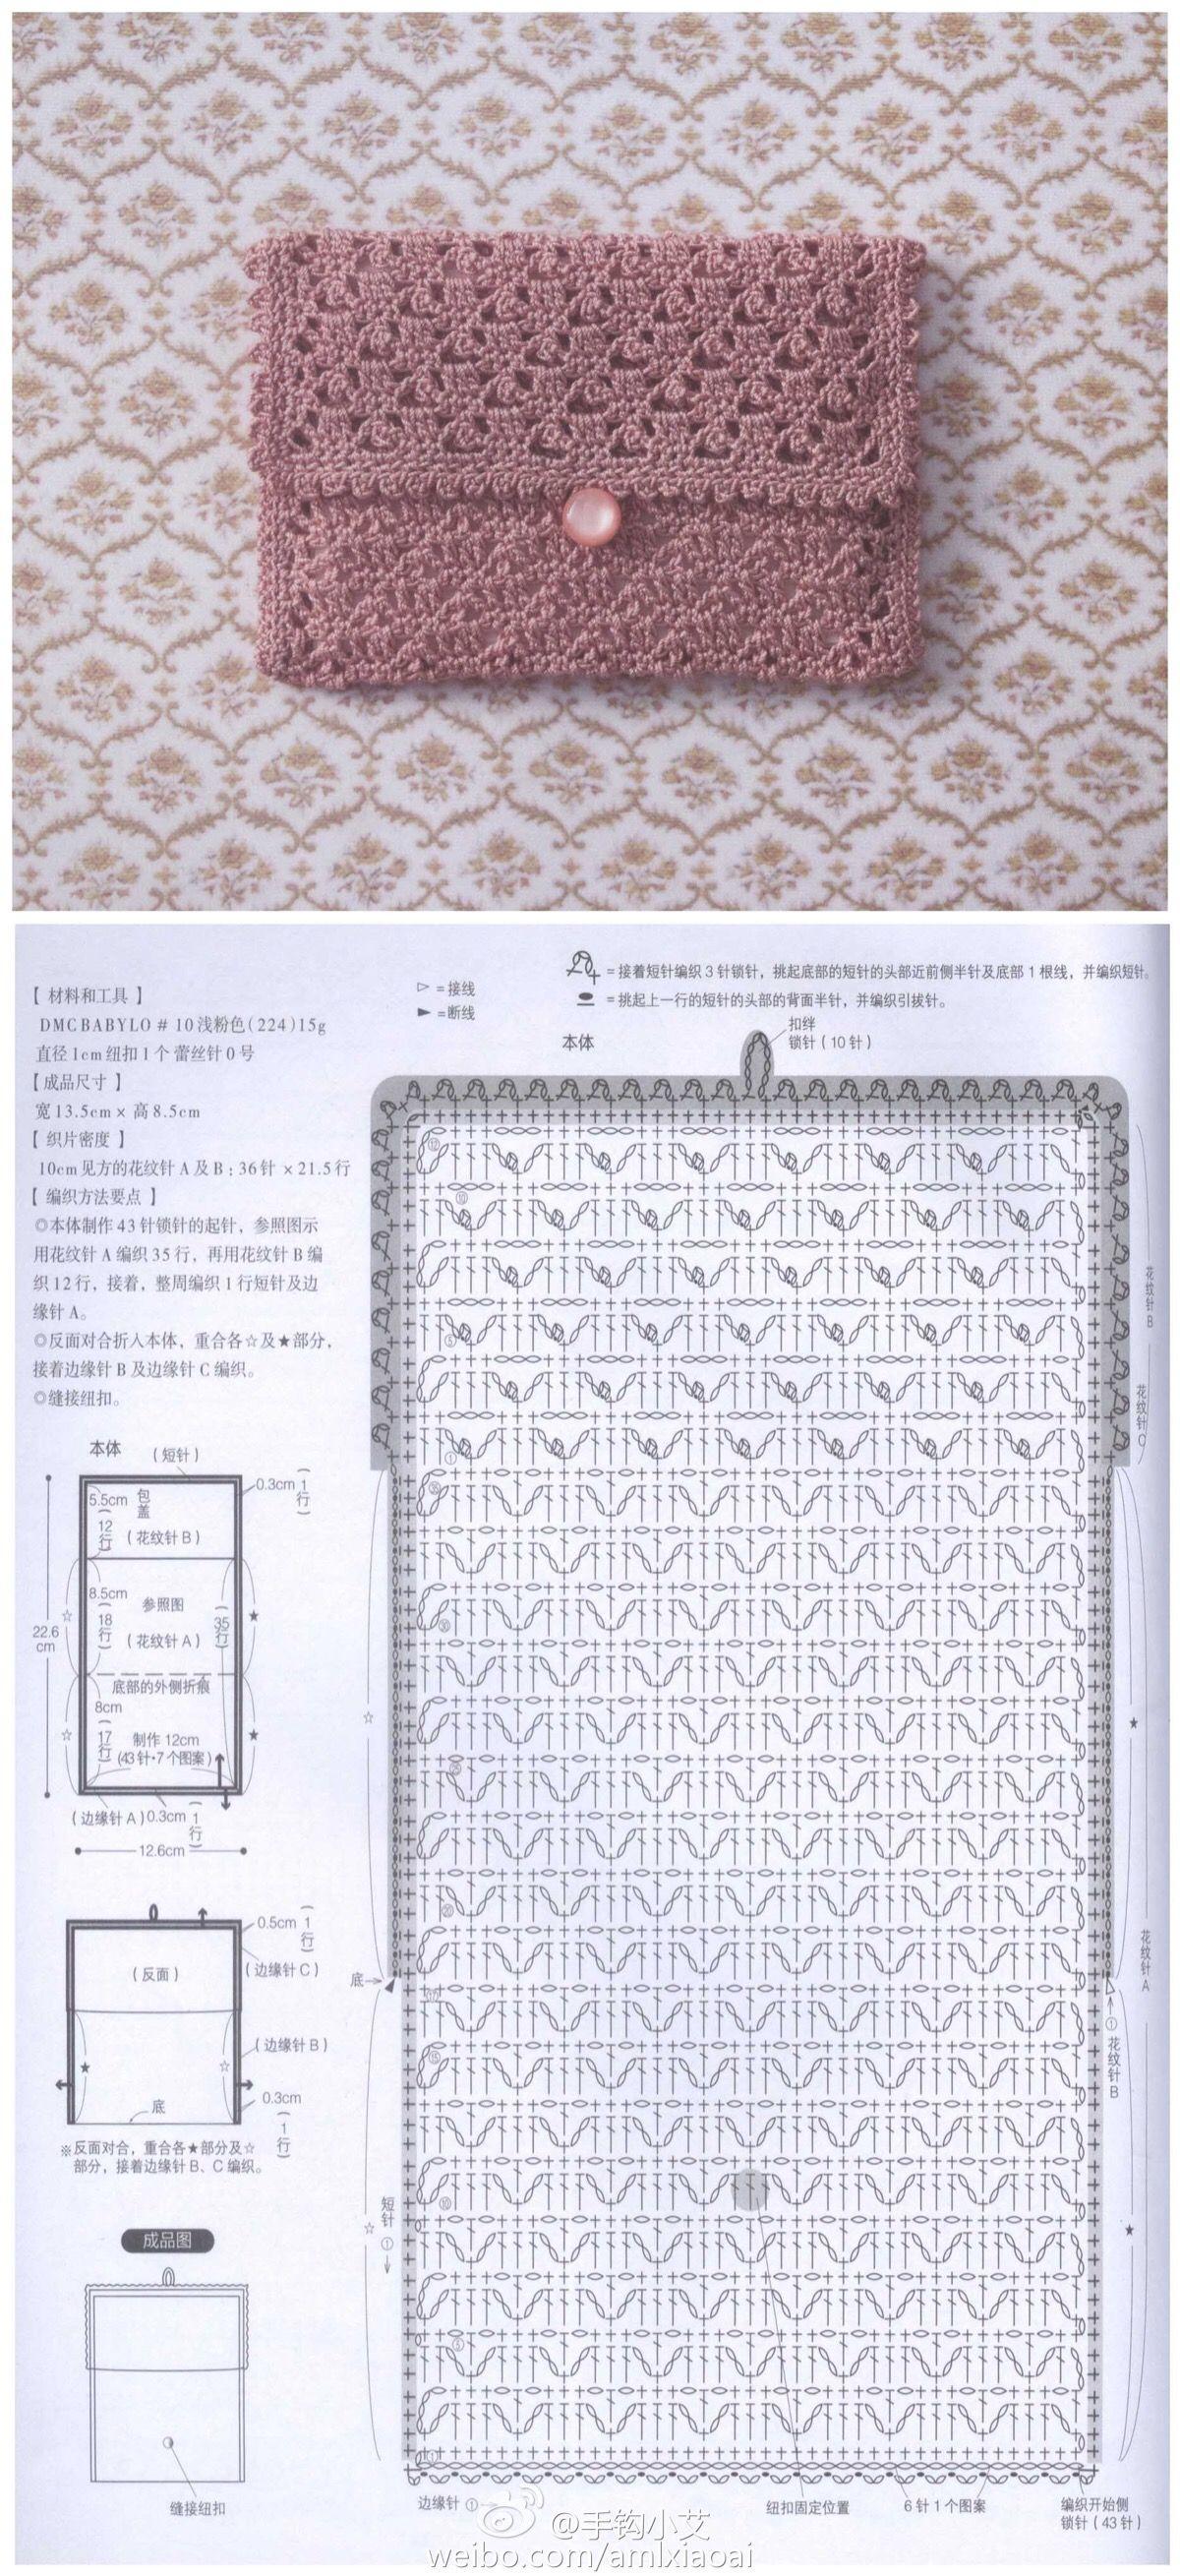 medium resolution of crochet purse pattern only diagram good enough